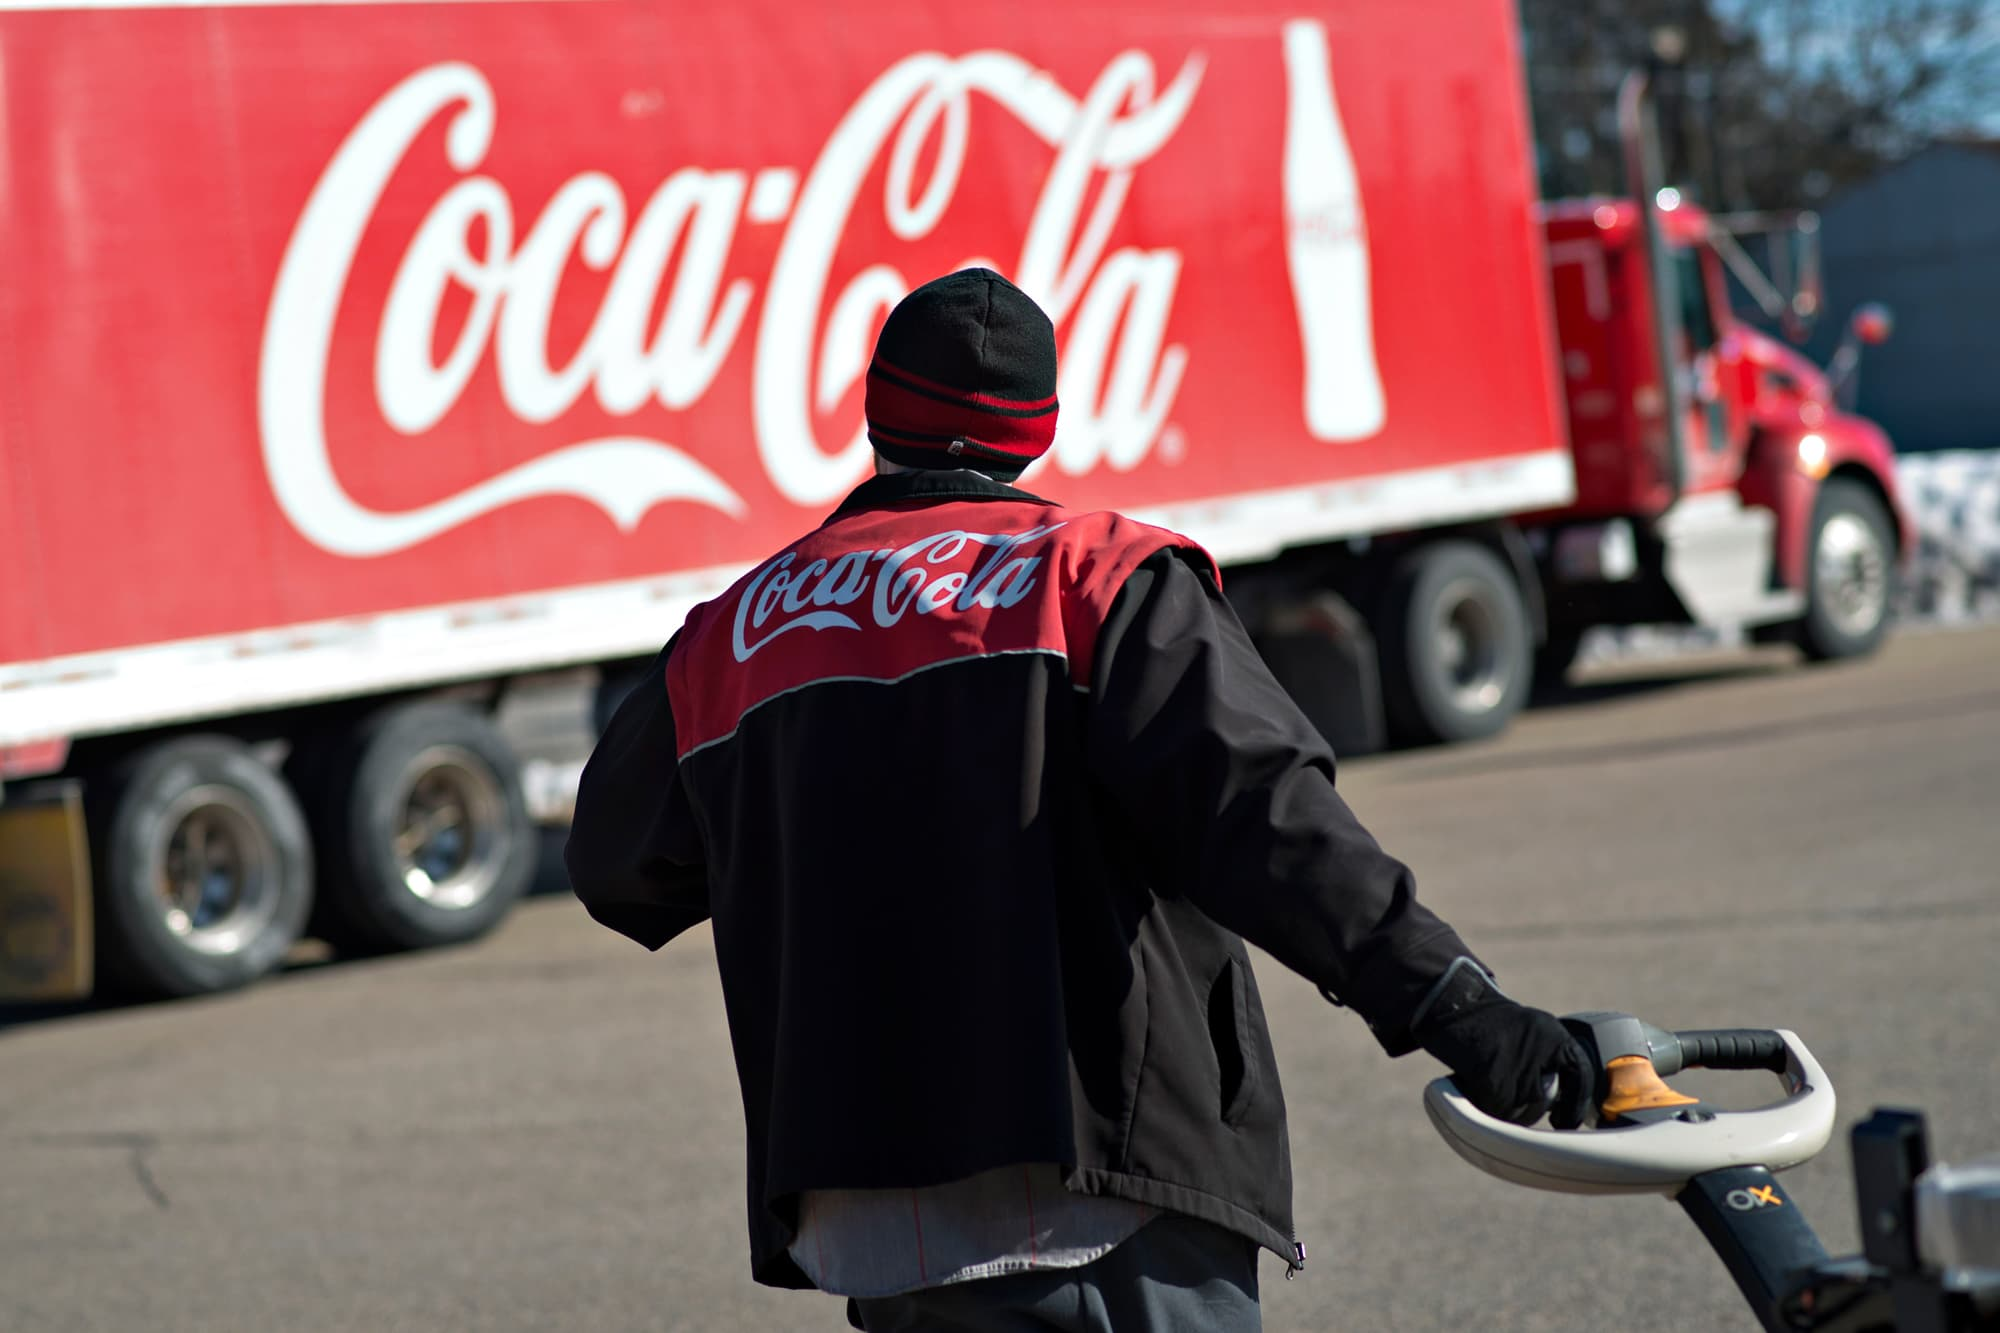 Coca-Cola says strong sales of Coke Zero Sugar are driving revenue growth